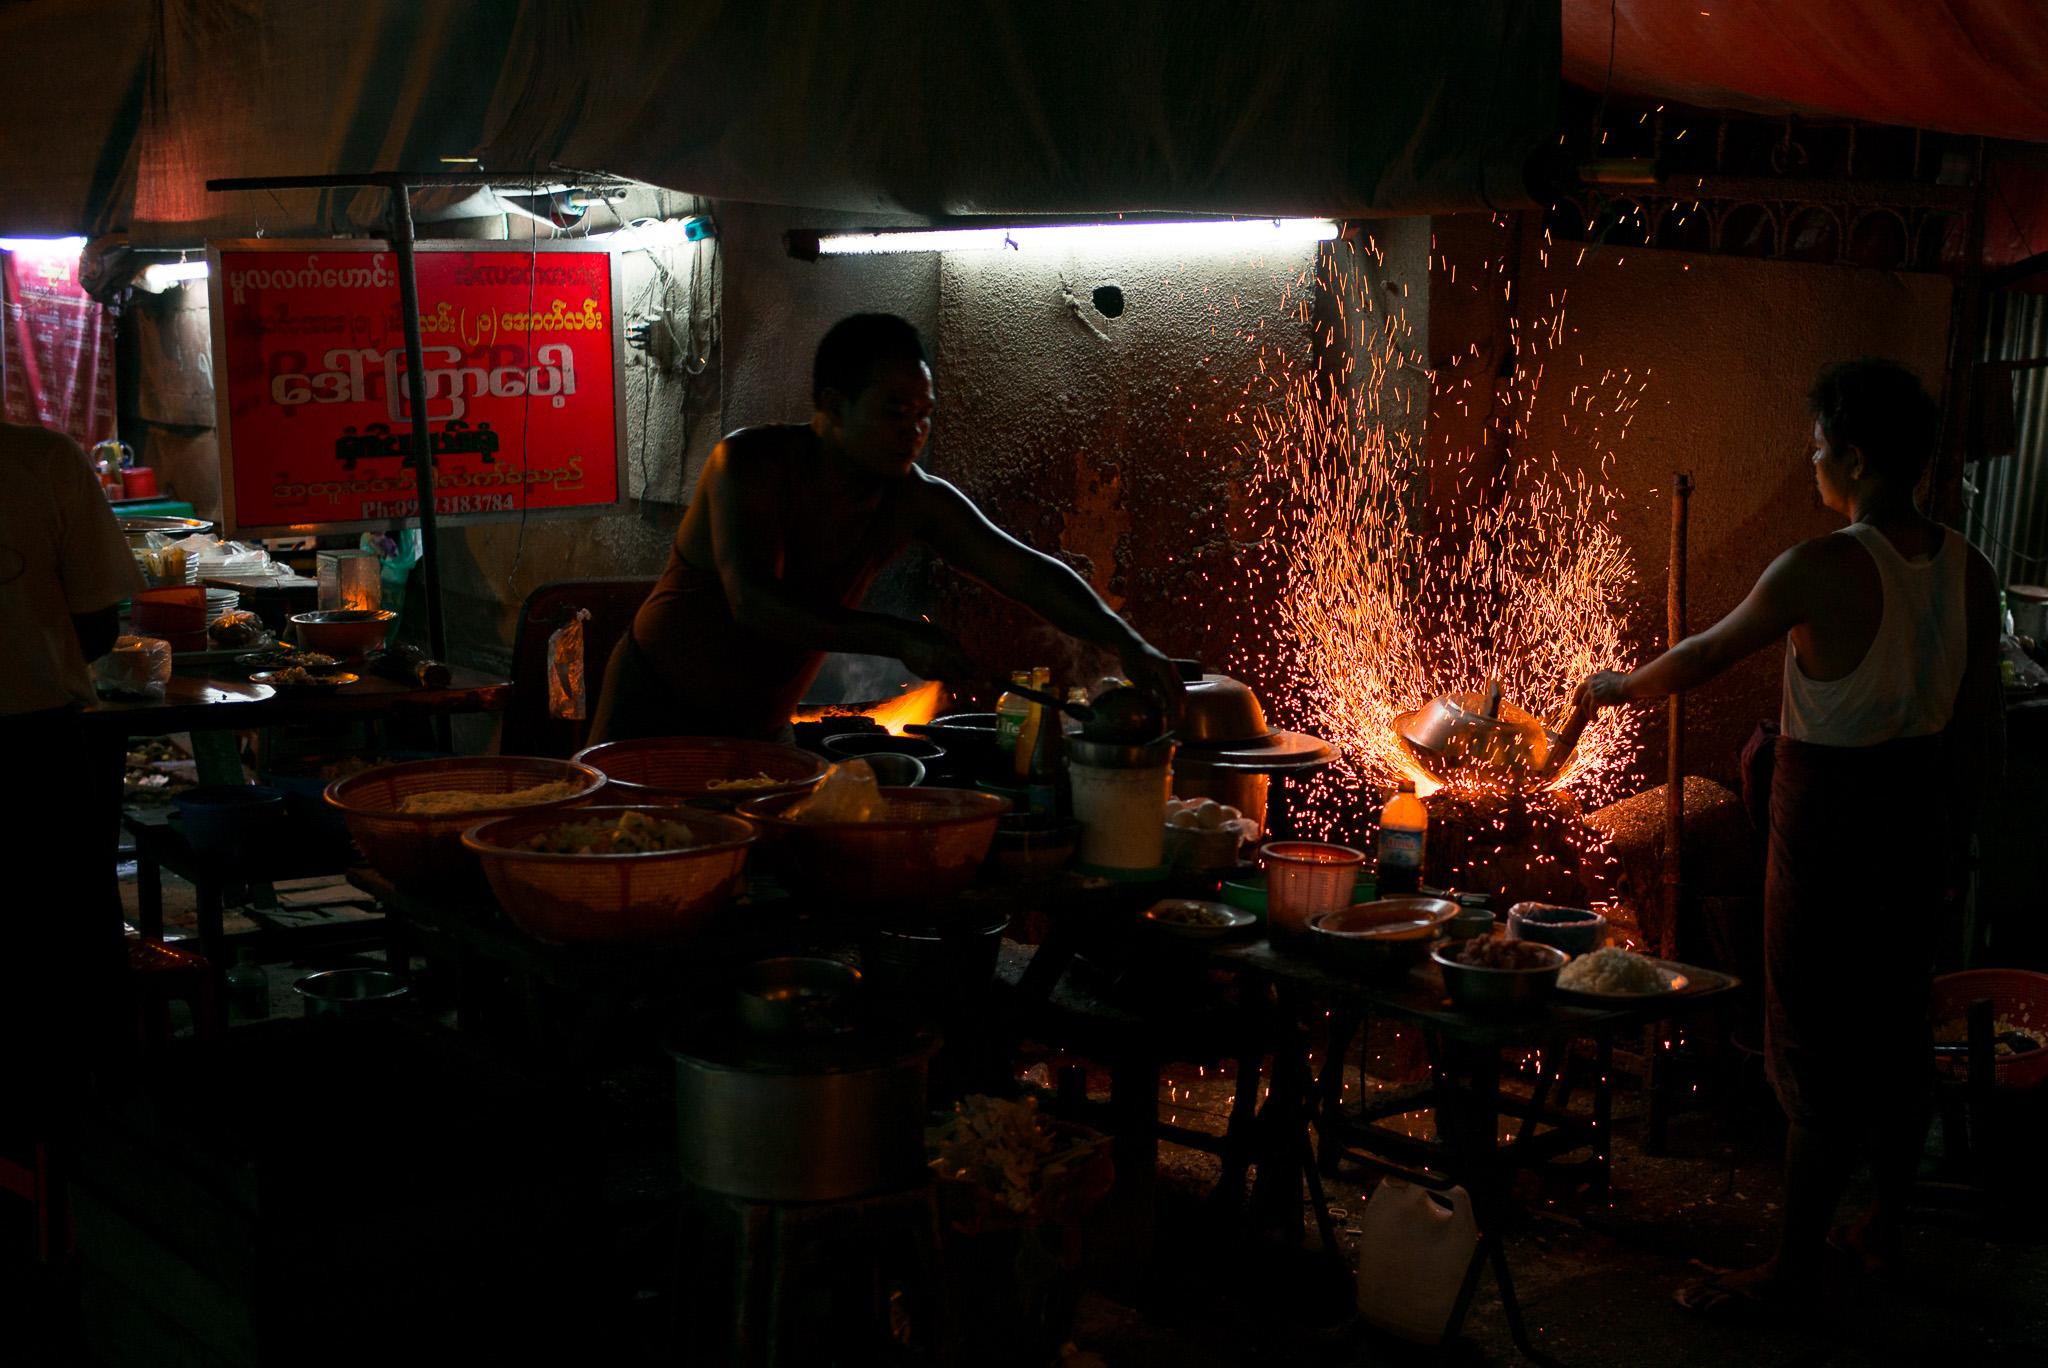 24-Burma-0100-P-1412.jpg